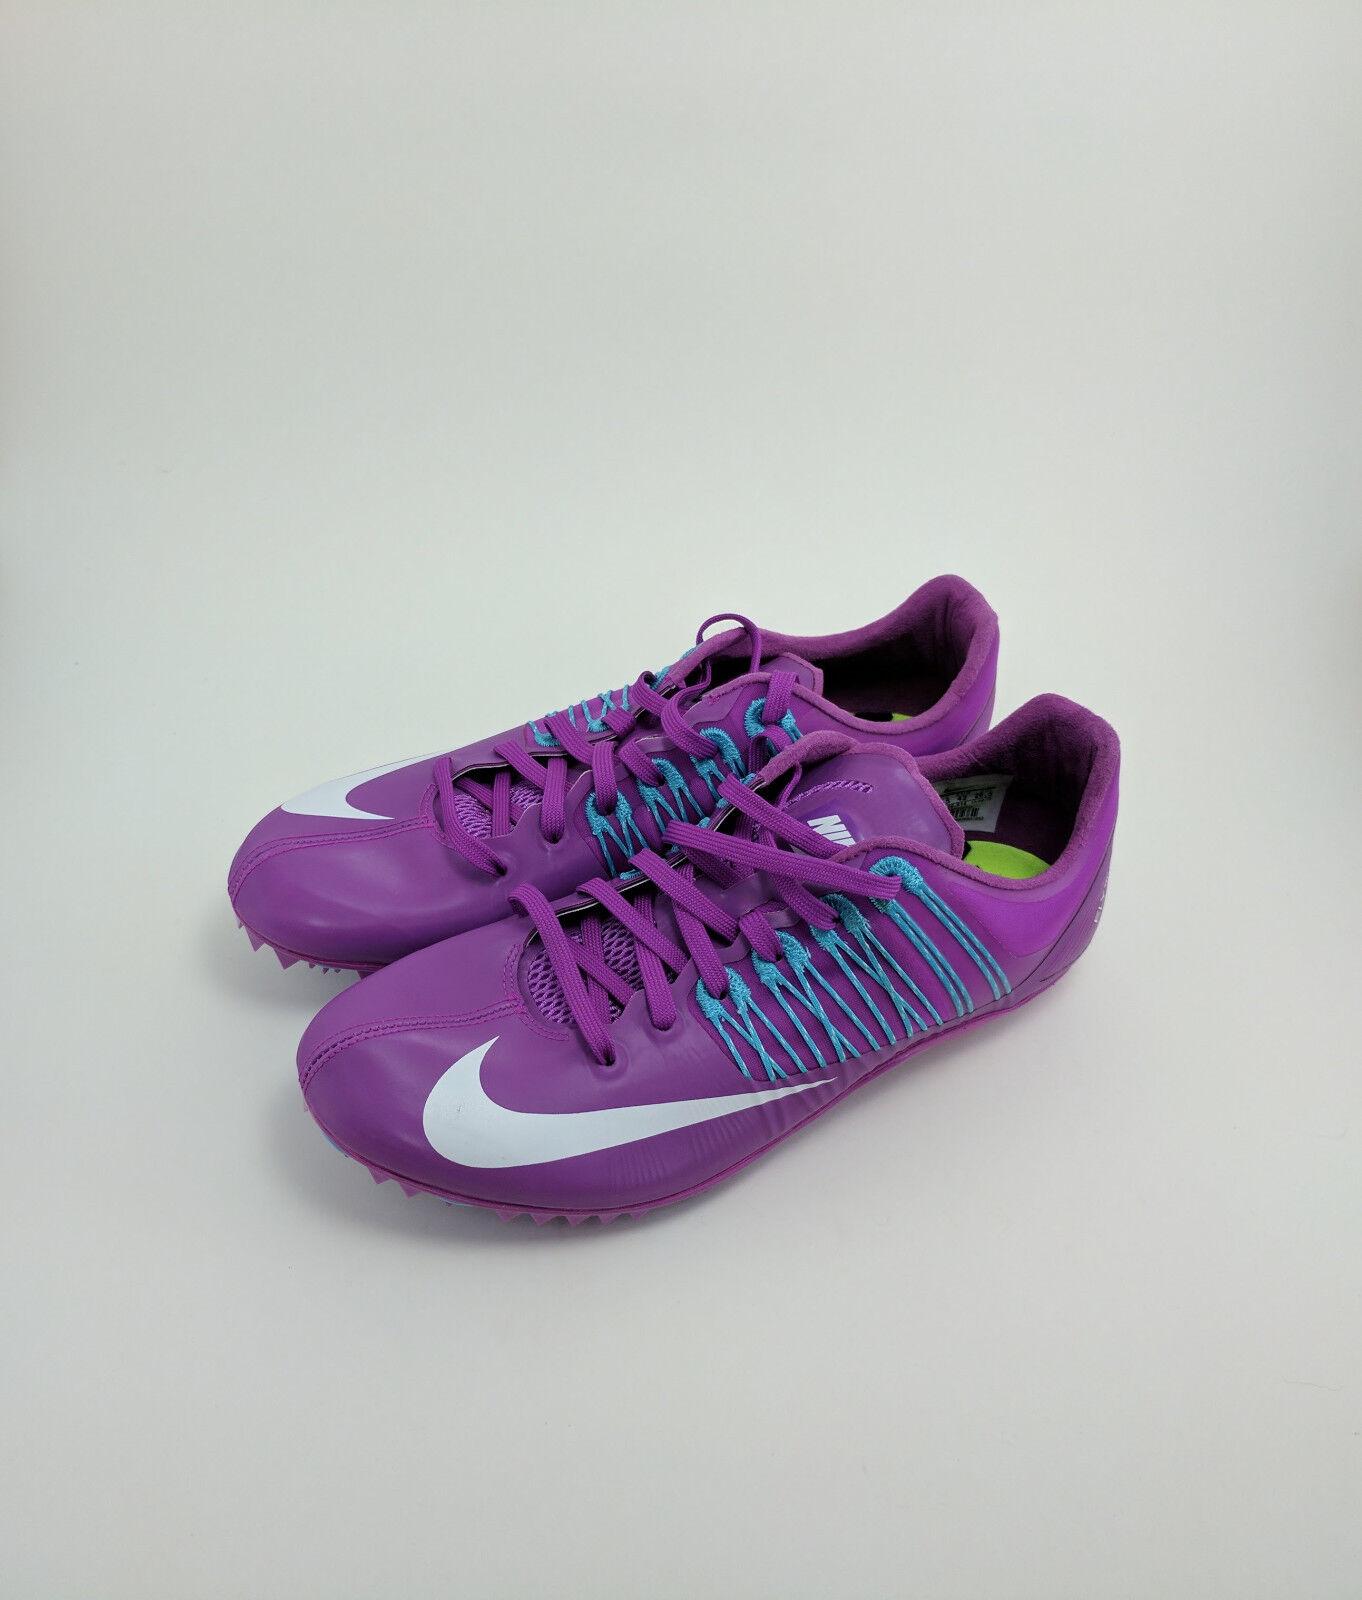 Neue nike zoom celar 5 - track sprint spikes hyper - 5 violett lila sz 8,5 629226-514 5ca285